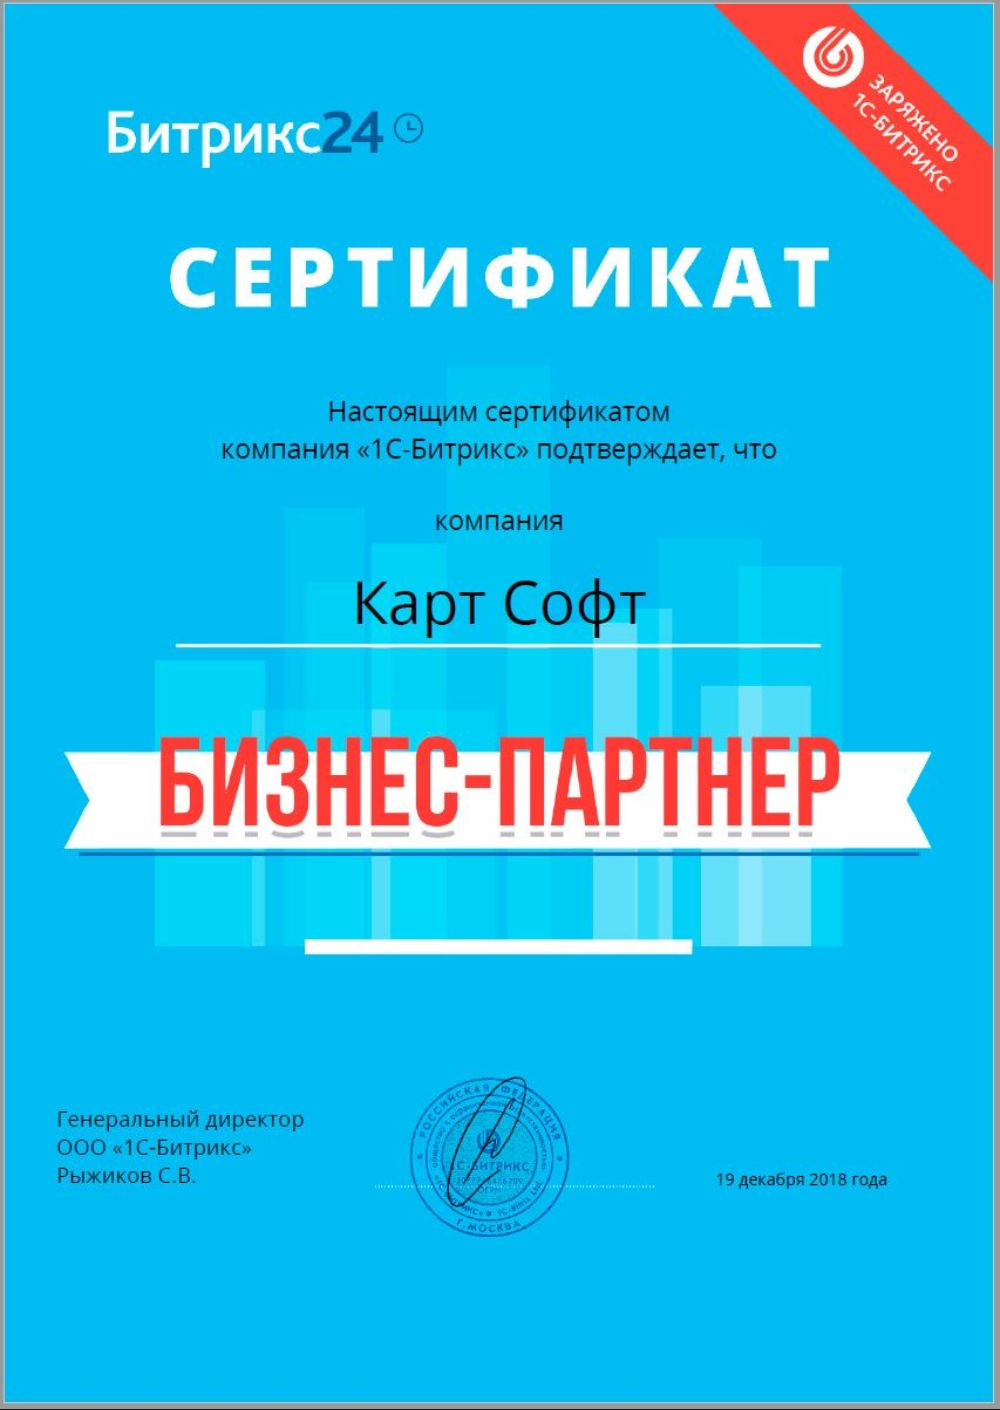 КартСофт партнер Битрикс